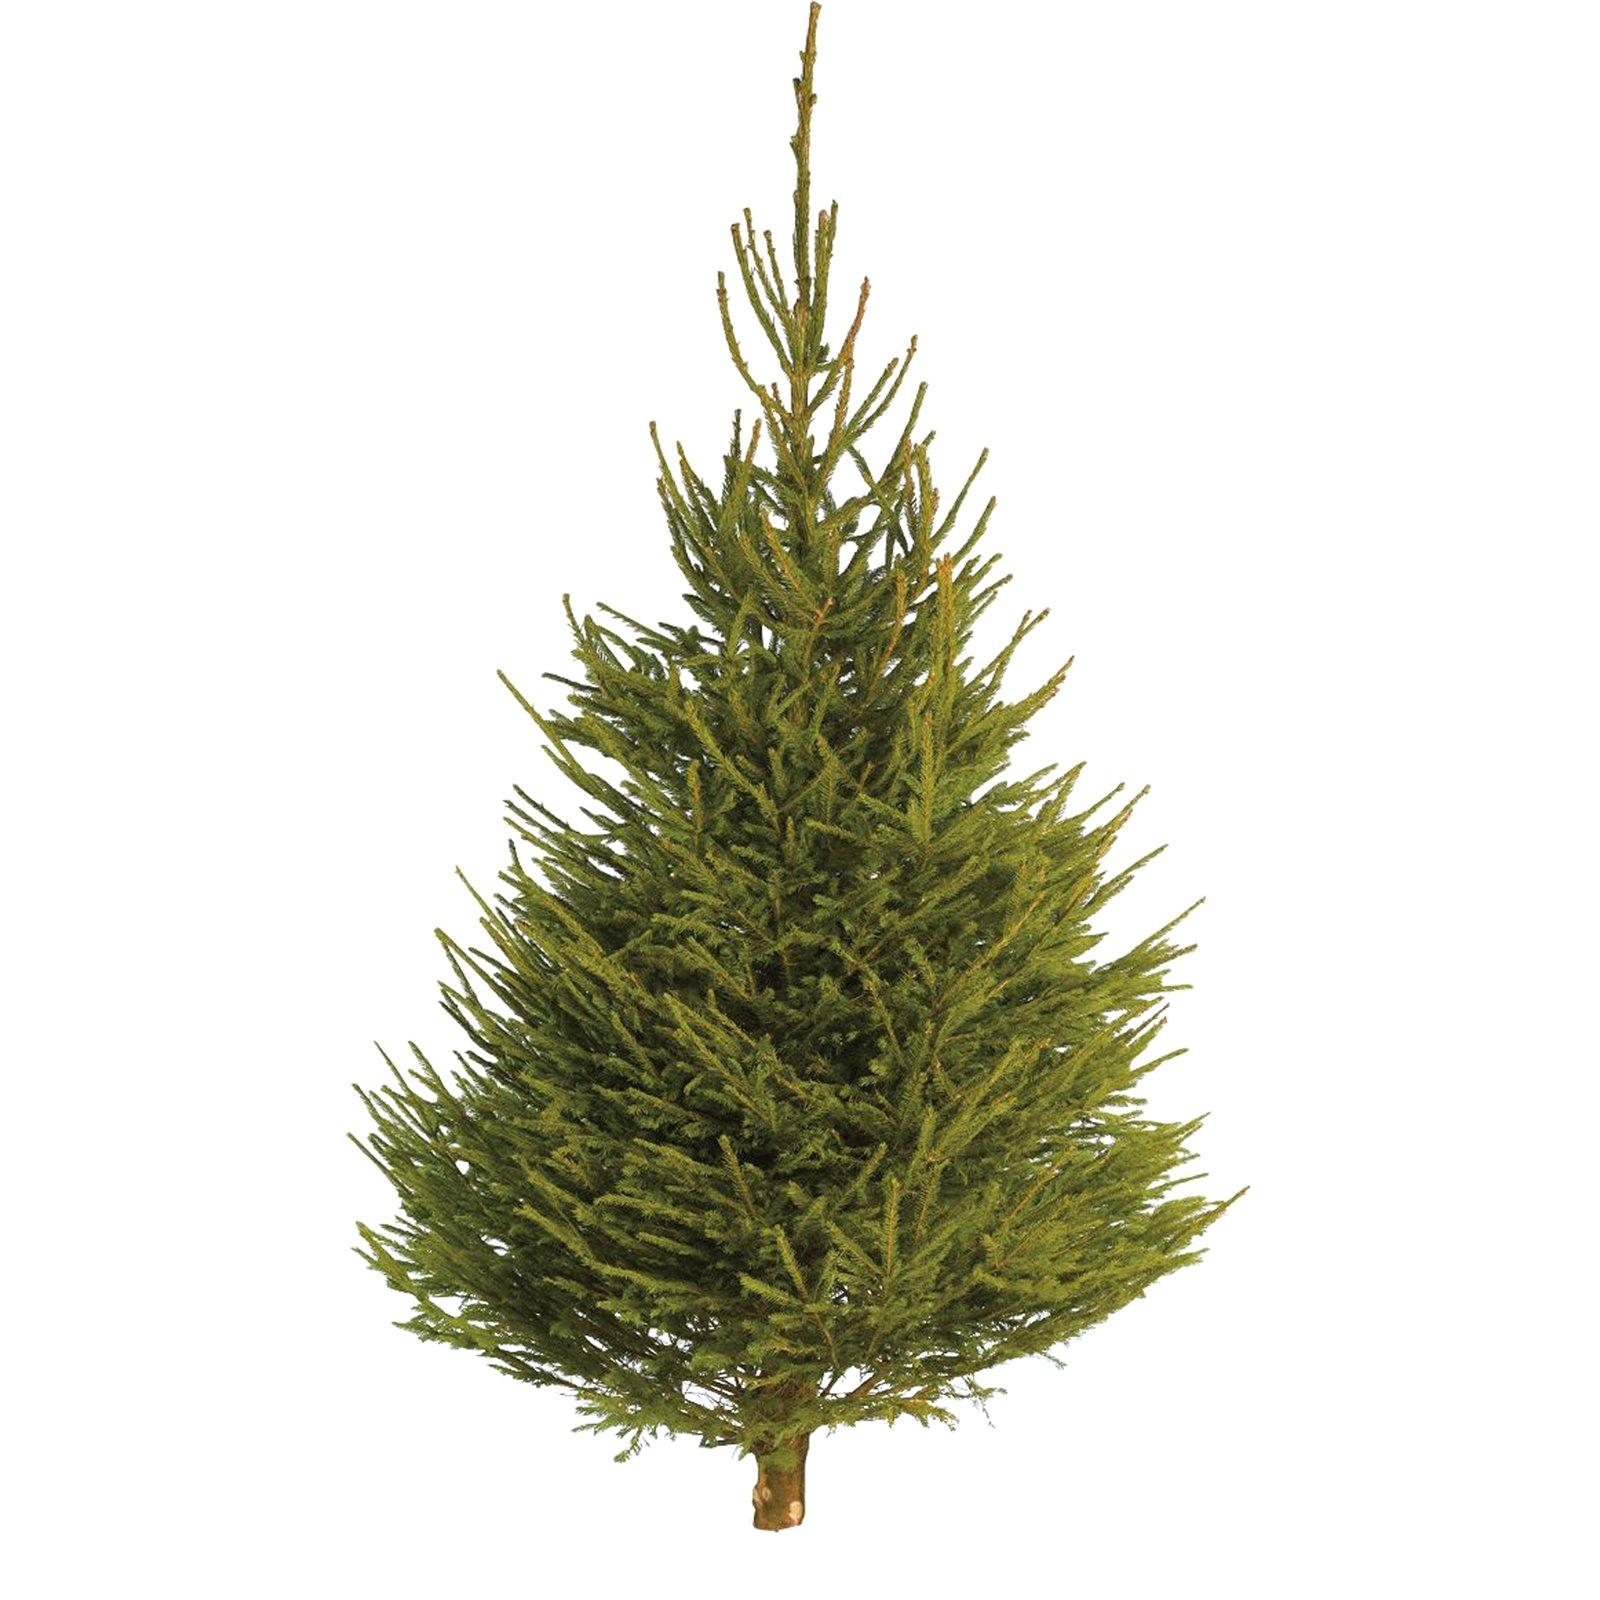 Real Christmas trees free instore at Homebase (found Saffron Waldon)